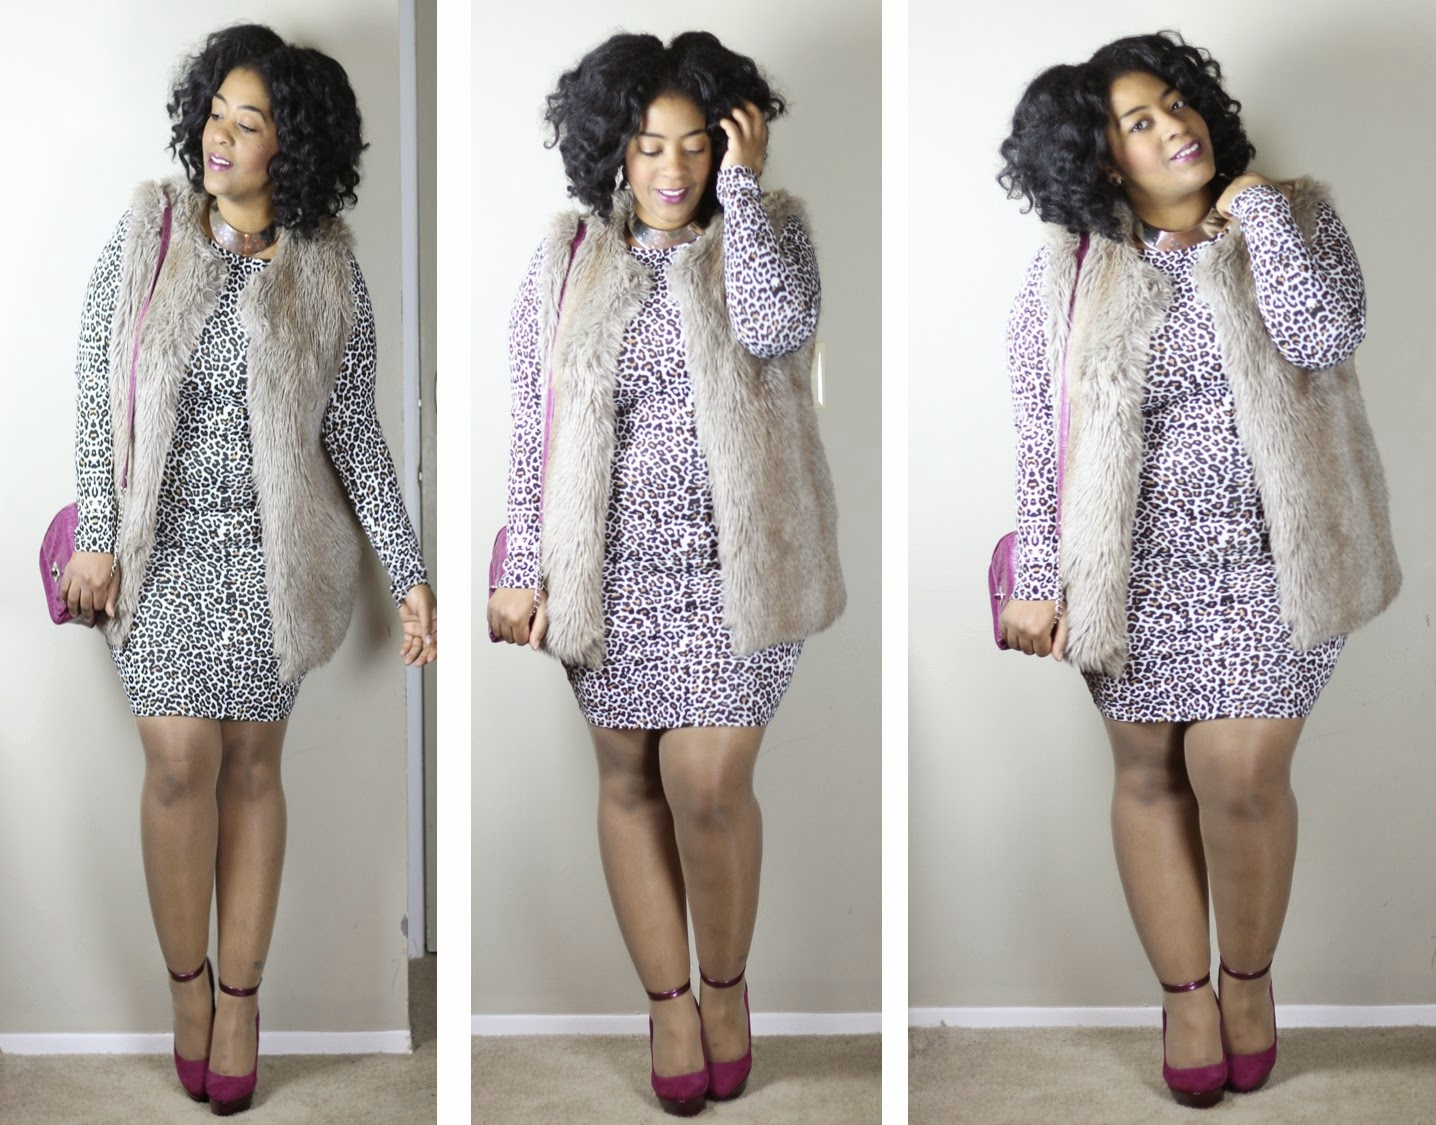 Vest style night dresses